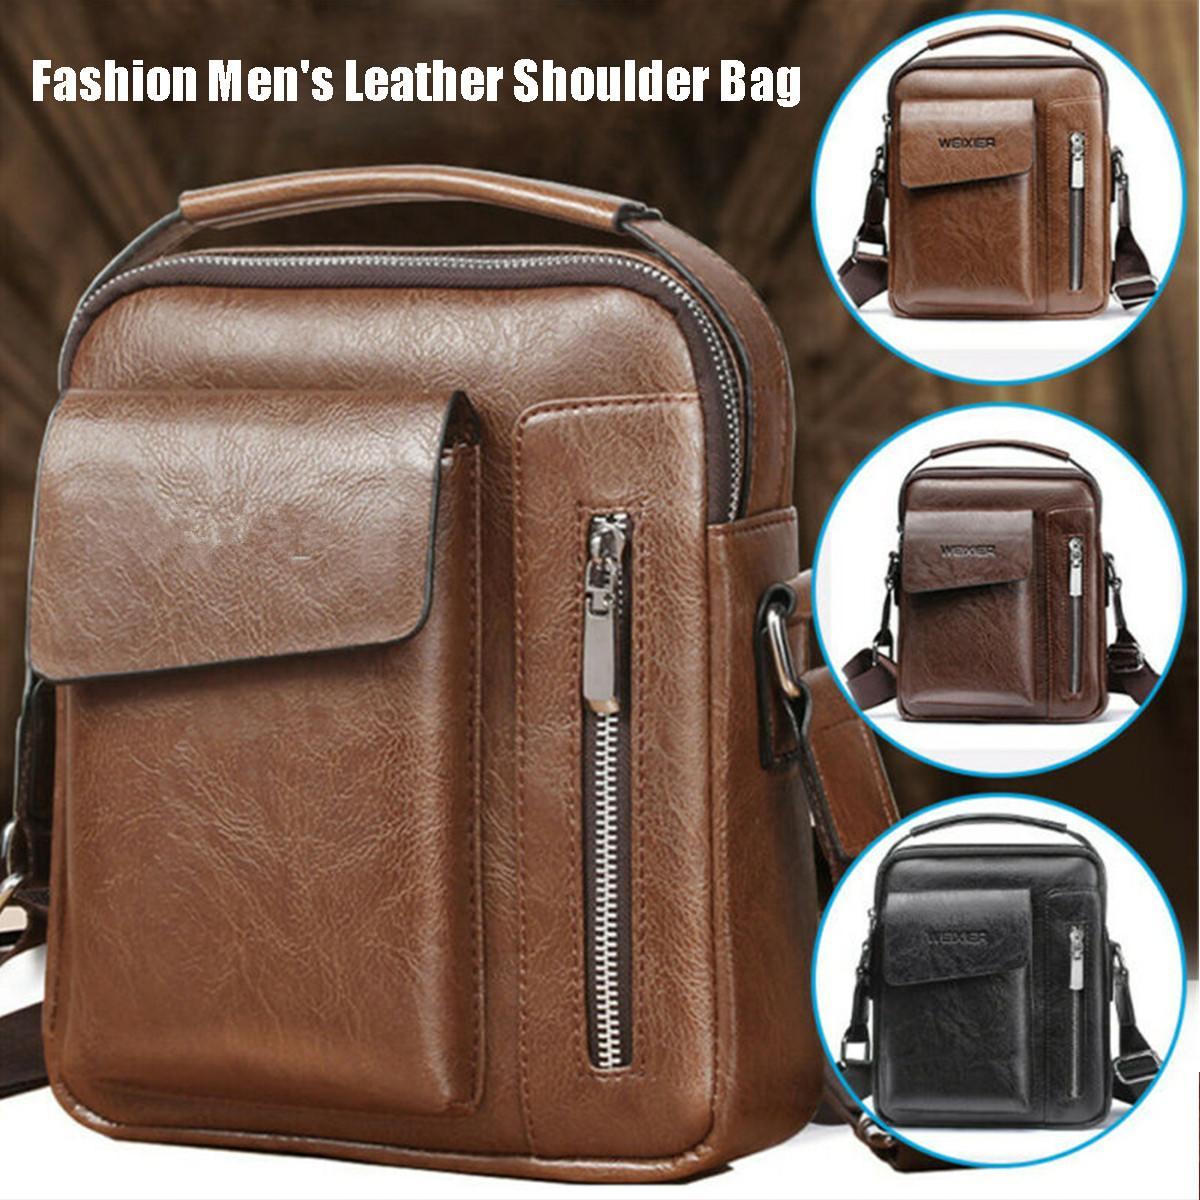 Vintage Messenger Bag Men Shoulder Bag PU Leather Fashion Crossbody Bags For Men Bags Retro Zipper Man Business Handbag